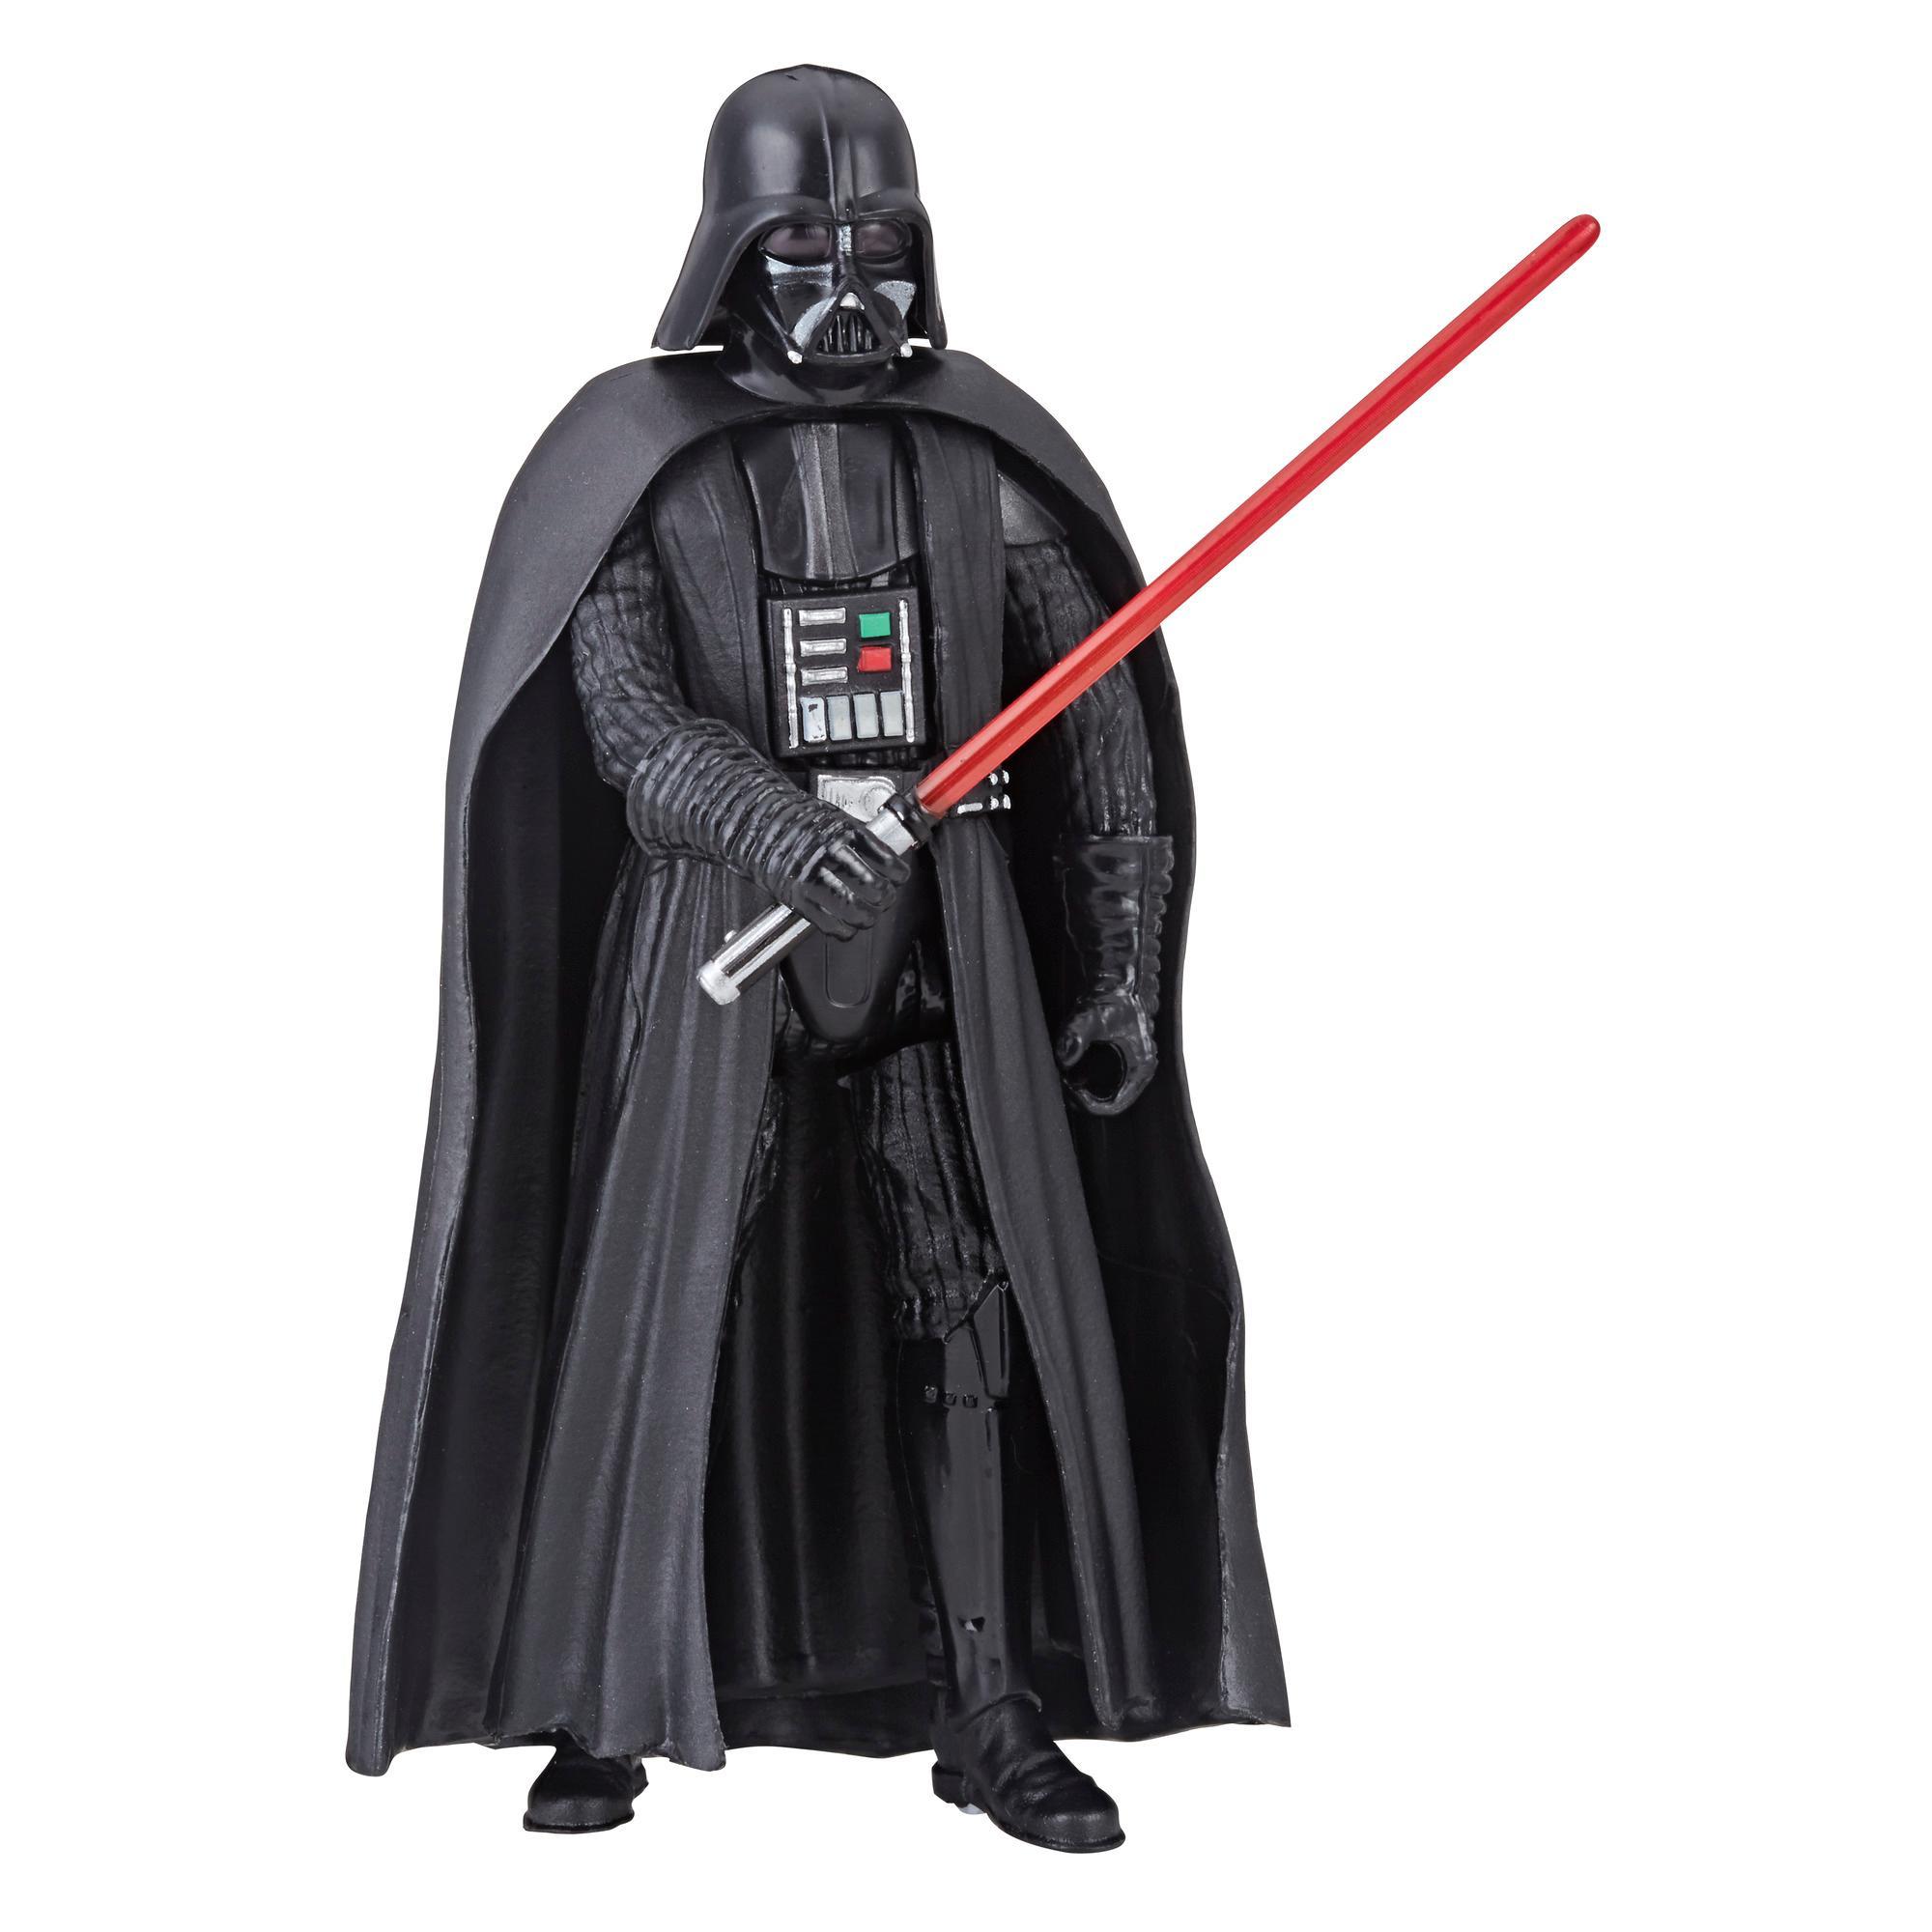 Star Wars Galaxy of Adventures Darth Vader Figur